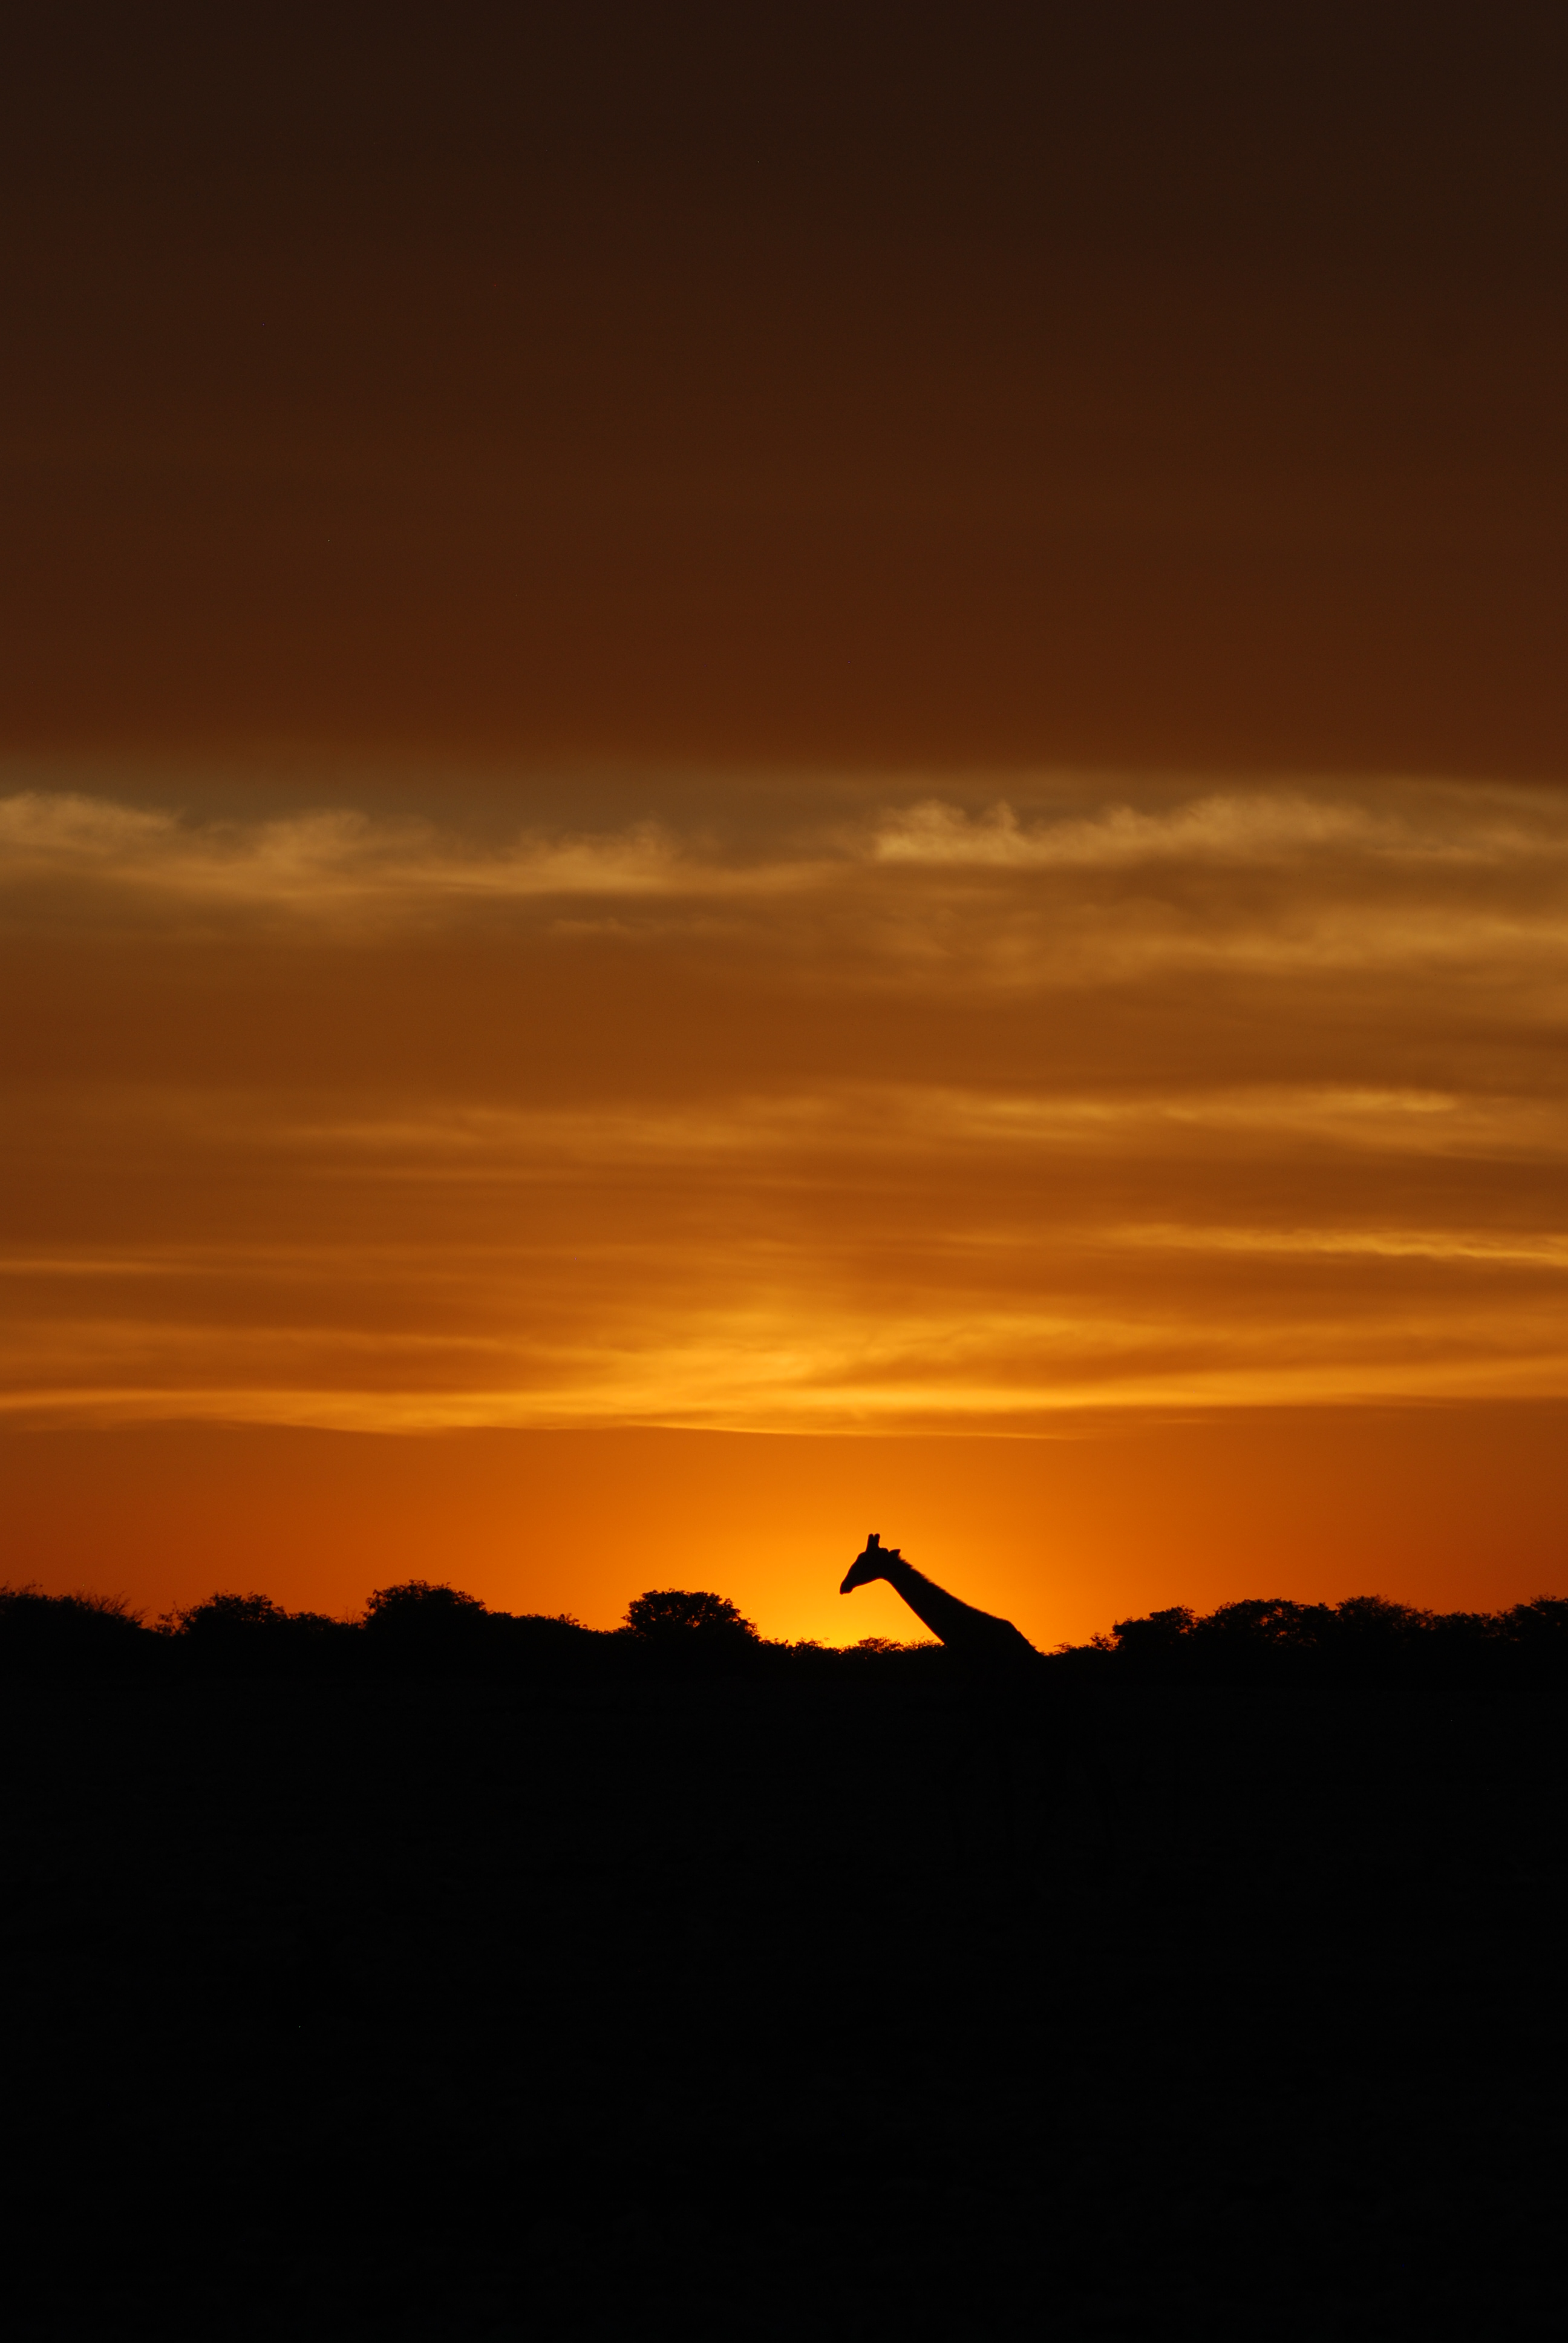 Sundowner in Africa